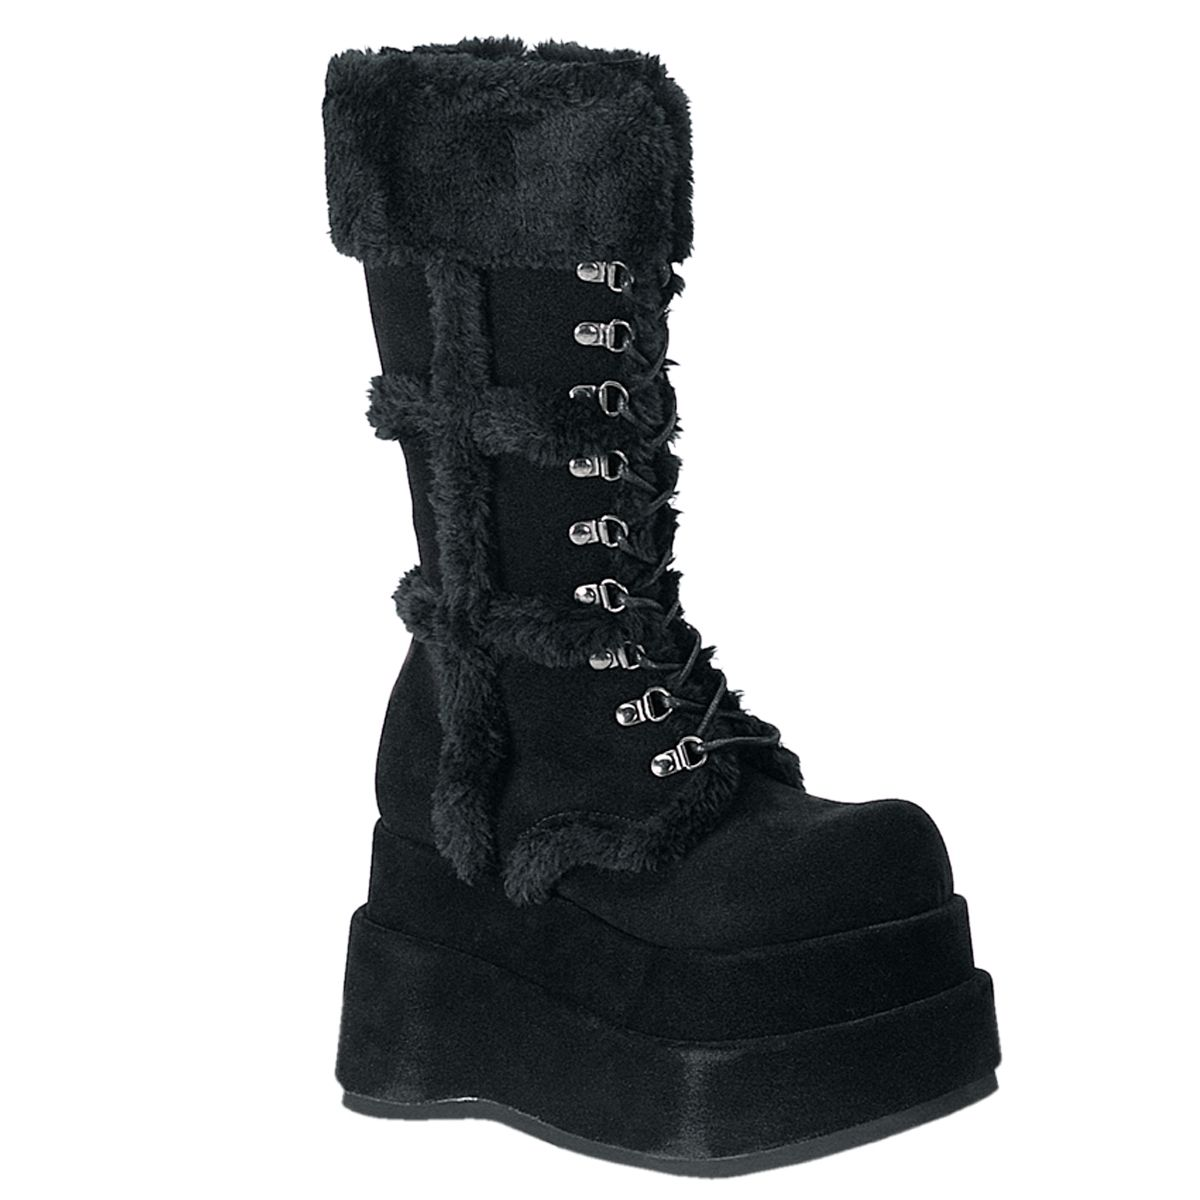 c5603d7d17311 PL - Sklep z butami PLEASER - high heels, kozaczki, klapi, sandałki, buty  damskie - BEAR-202